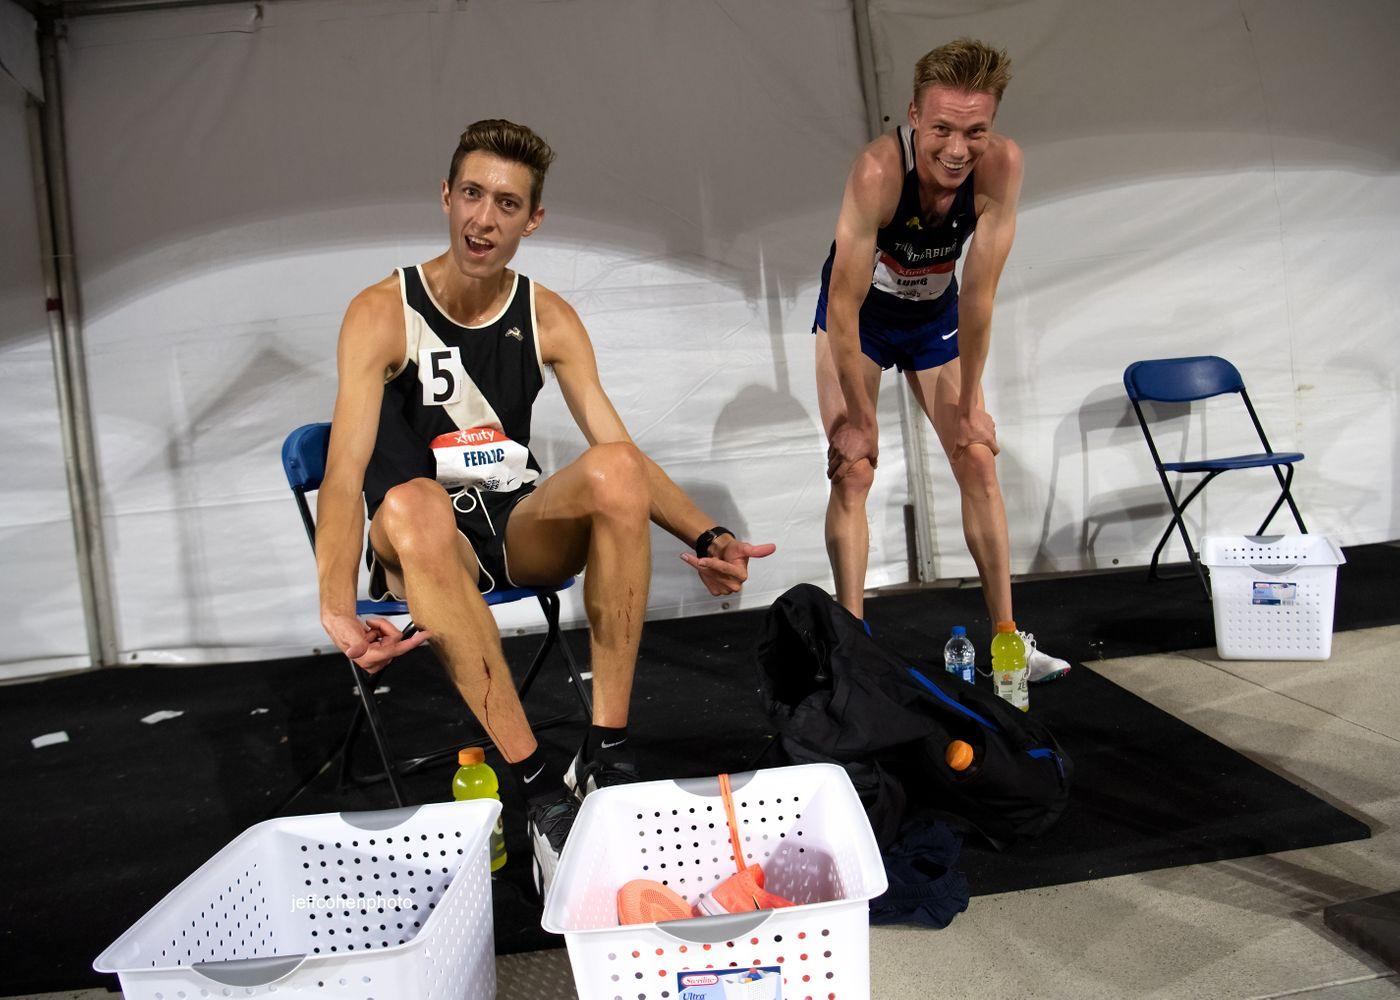 Mason Ferlic, 5000 meters, 2021 Usatf golden games